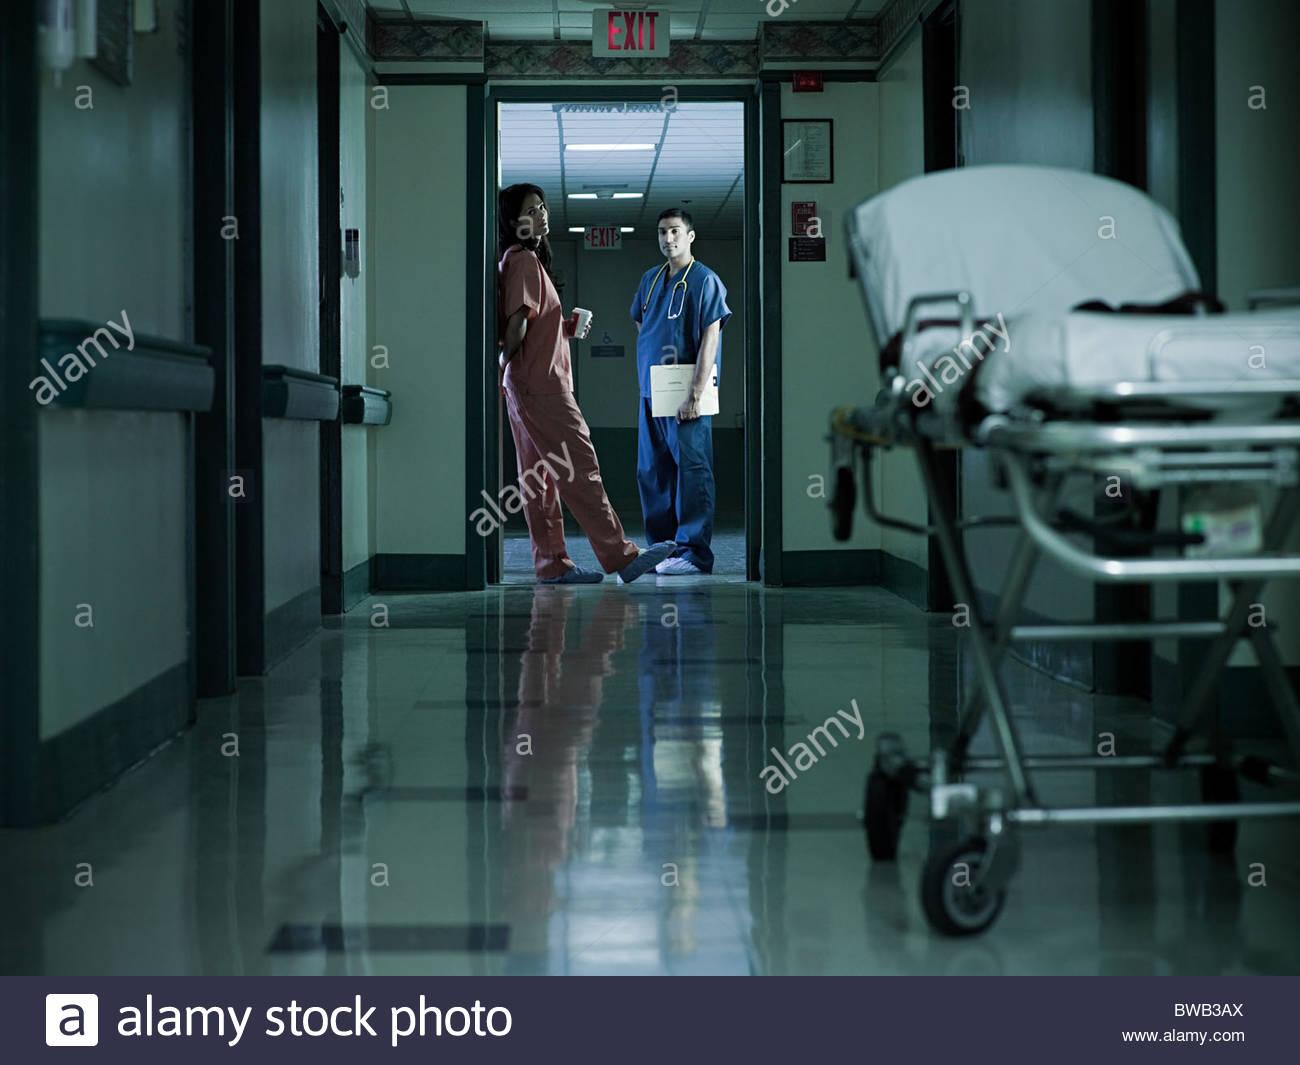 Hospital staff in corridor - Stock Image